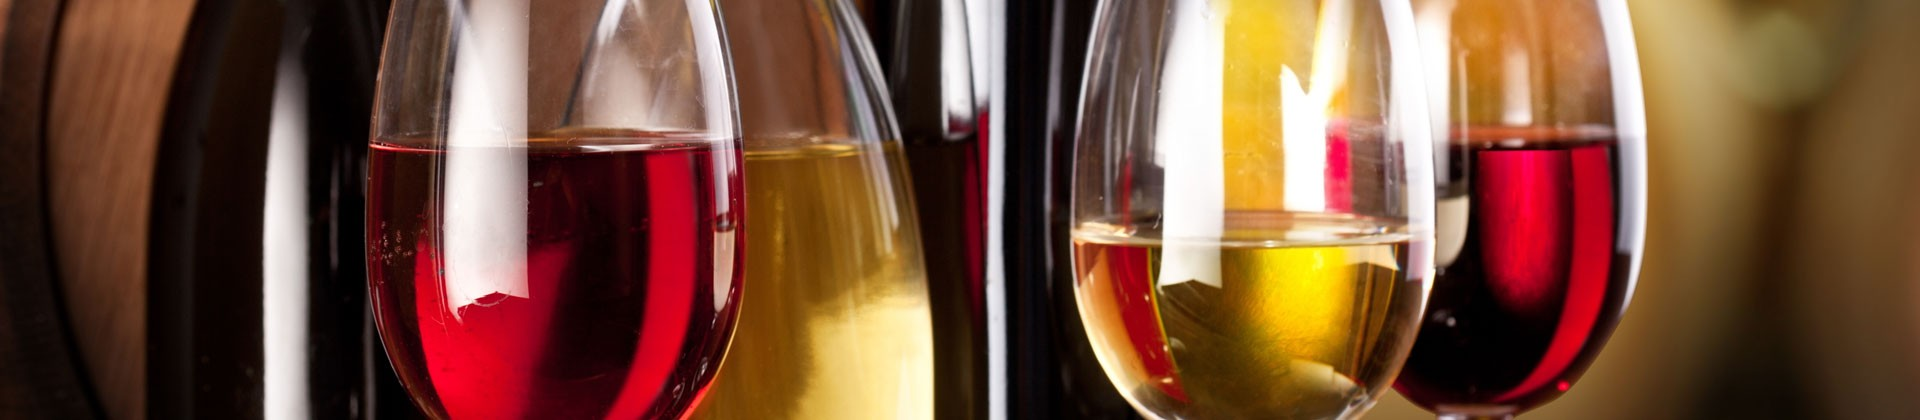 https://www.goodmorningtenerife.com/wp-content/uploads/2014/08/03_slide_wine_GM_Tenerife-1920x420.jpg